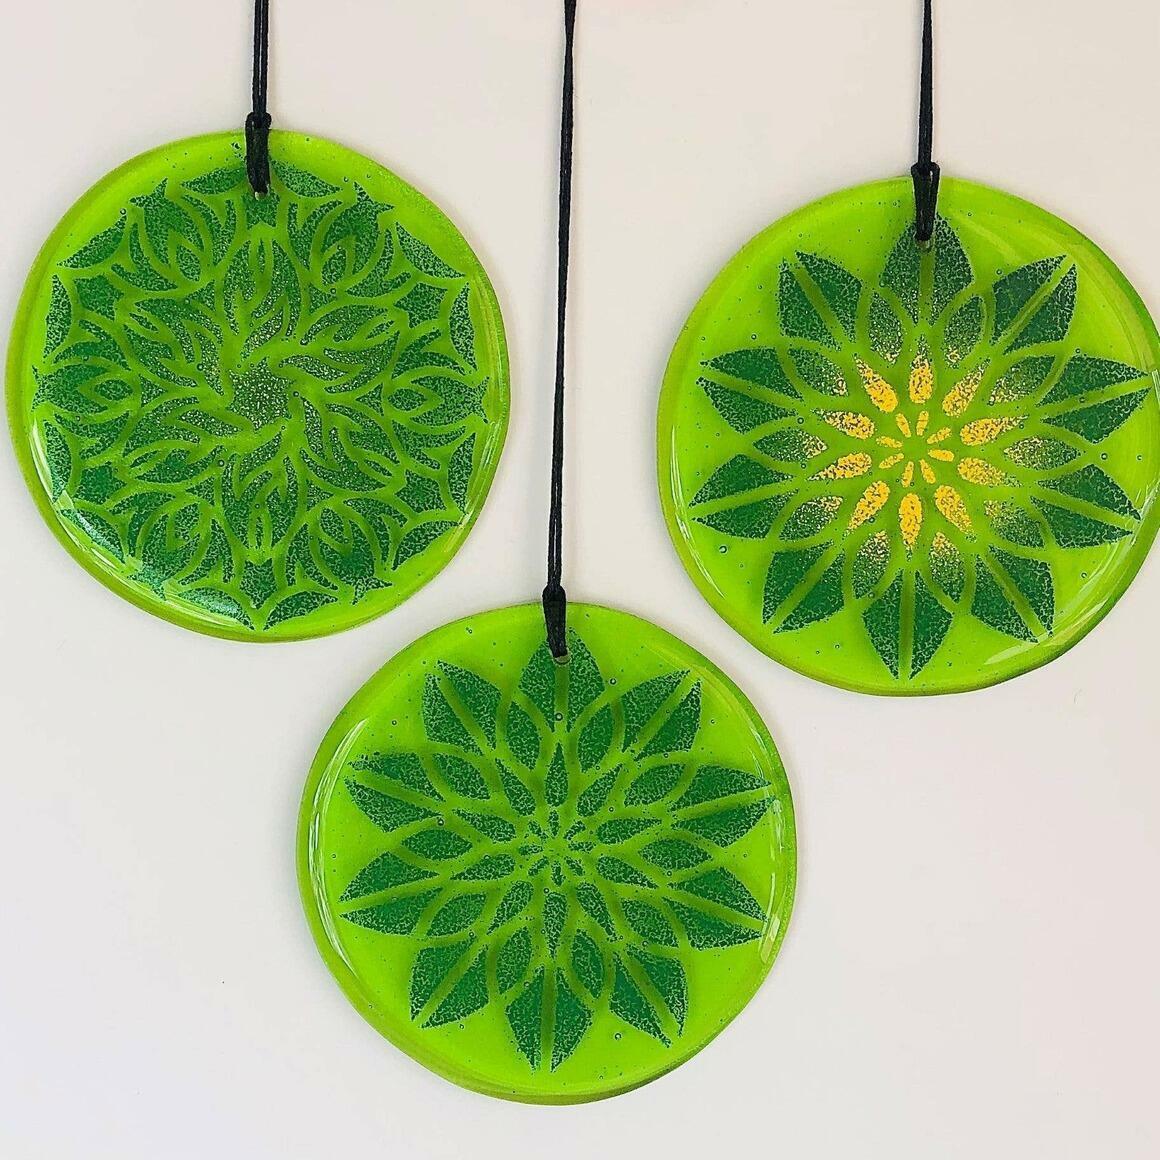 Glass Mandala Window Ornament Suncatcher - Spring Green | Trada Marketplace